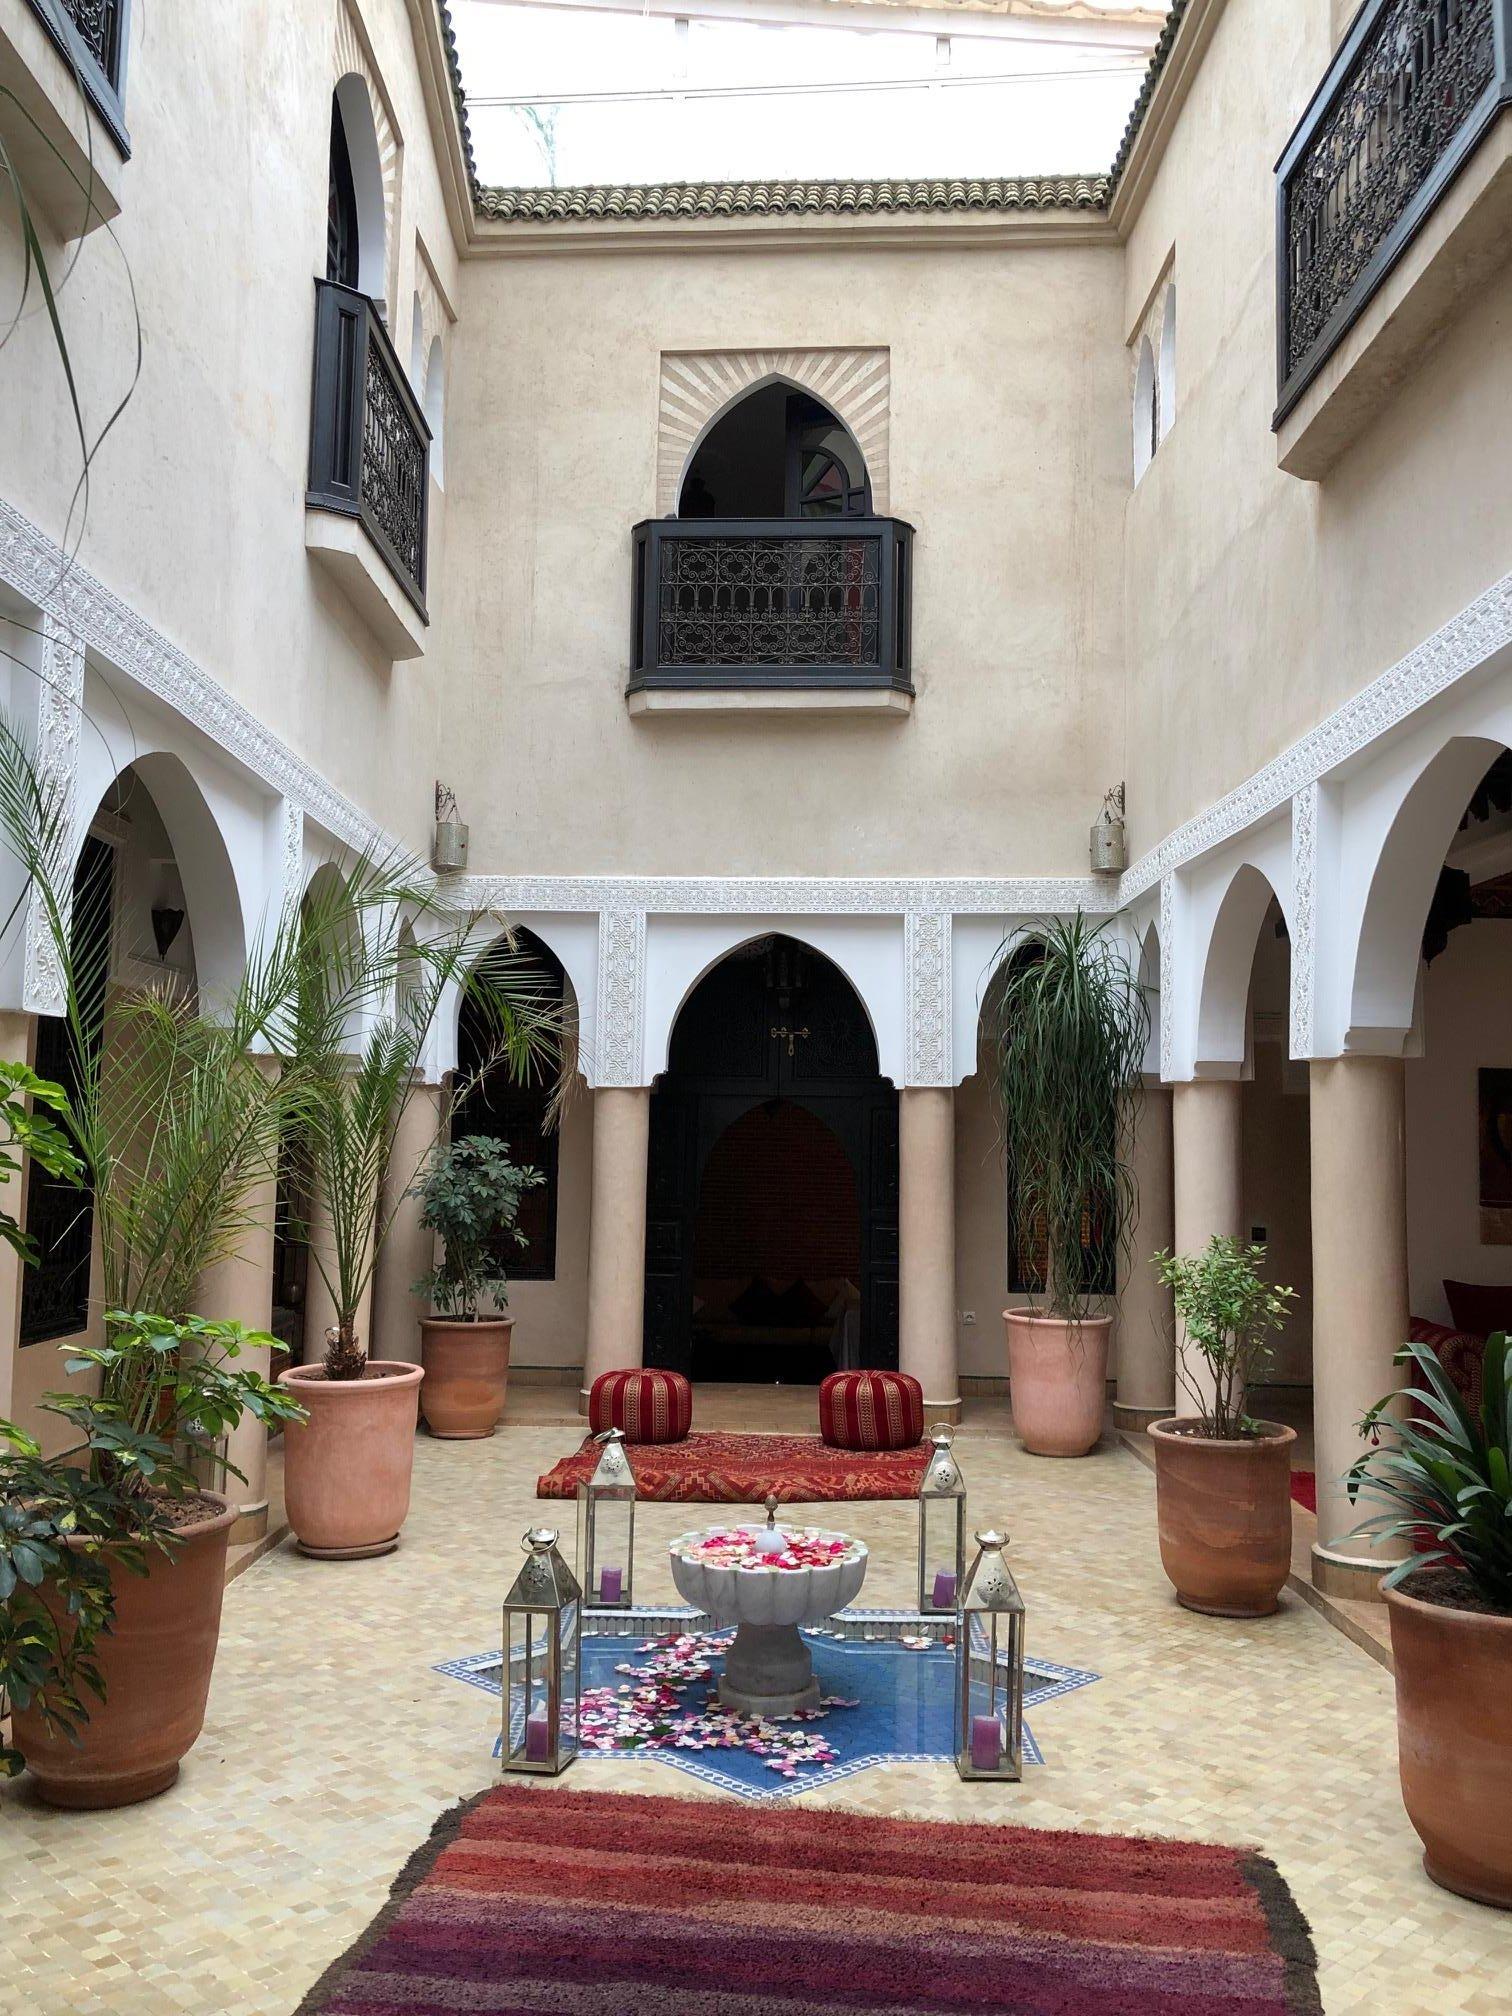 marrakech_riadbasim1